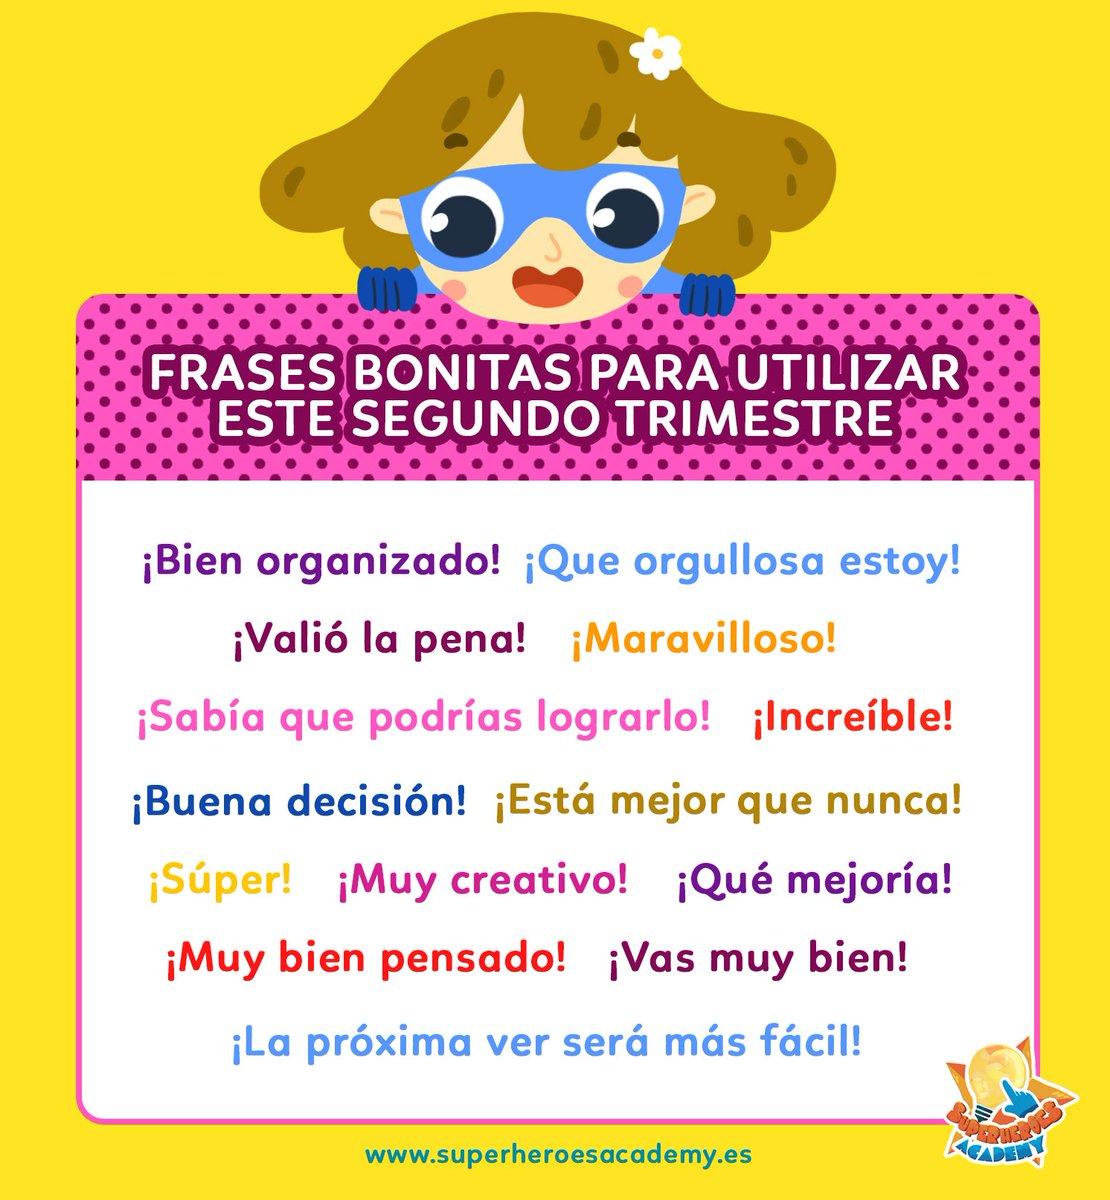 Superheroes Academy Auf Twitter Feliz Vuelta Al Cole